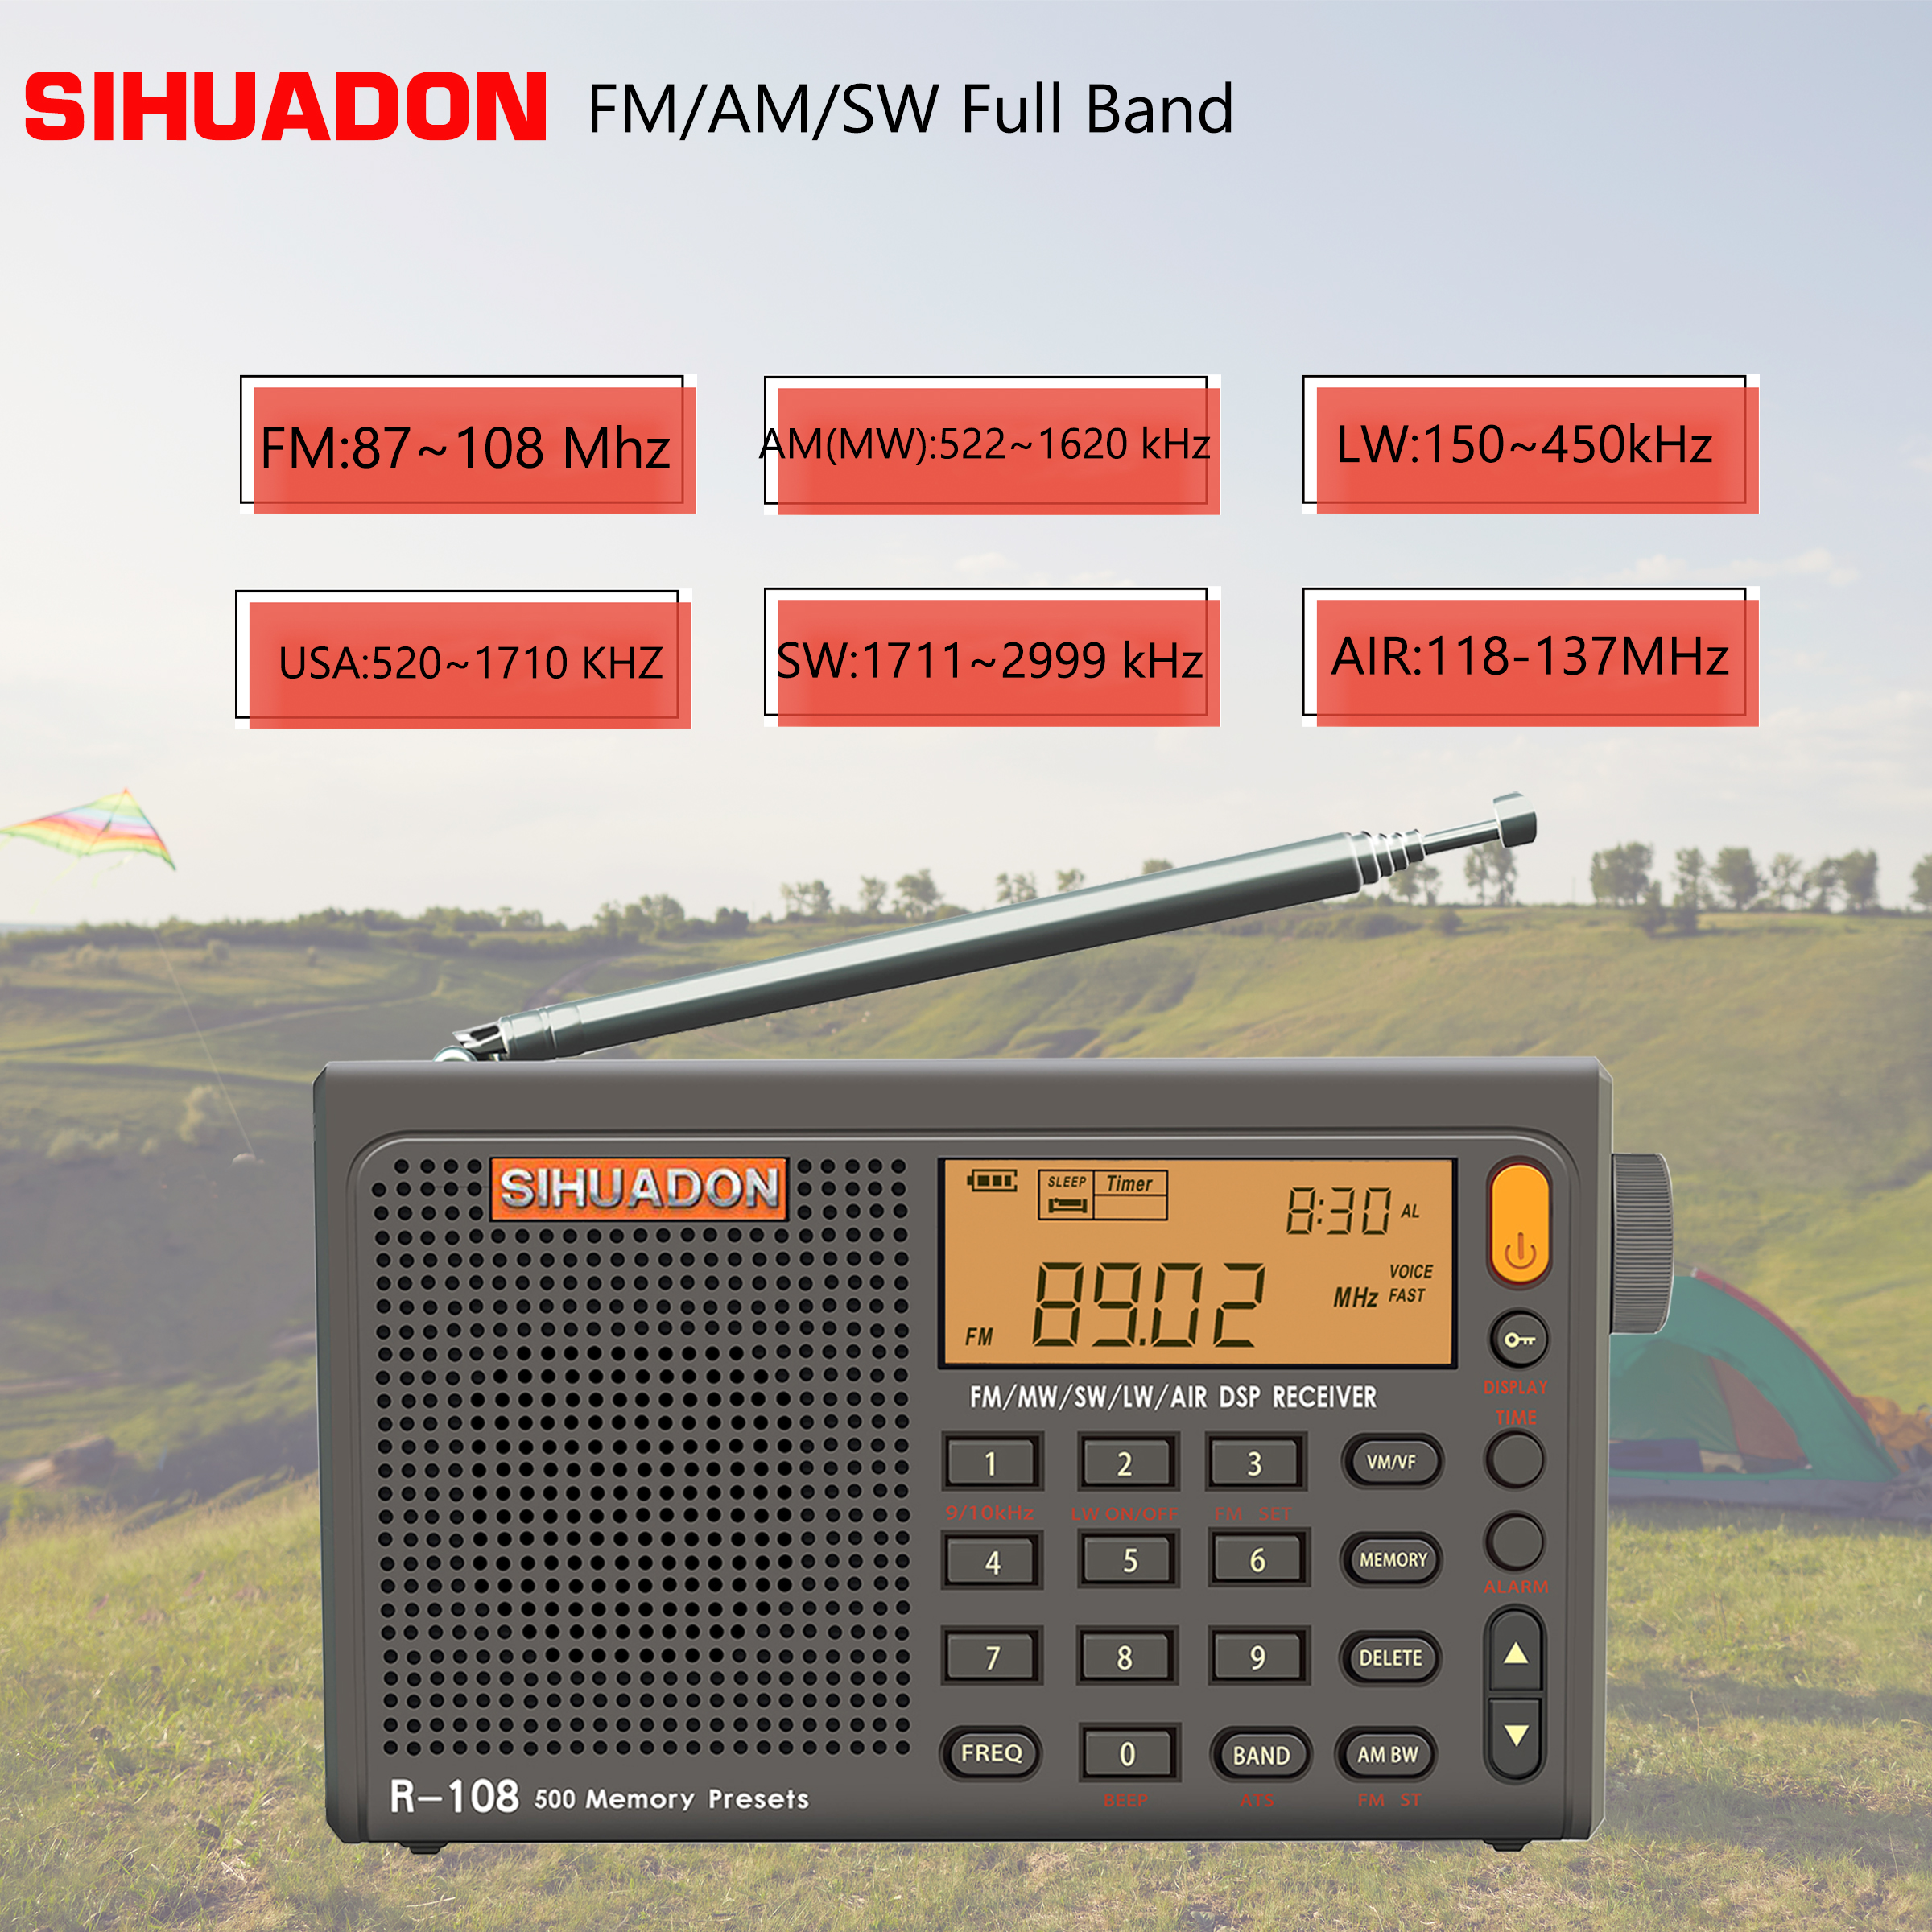 SIHUADON R-108 רמקולים נייד רדיו FM סטריאו הדיגיטלי רדיו AM מעורר שעון מלא בנד Pocket רדיו מקלט